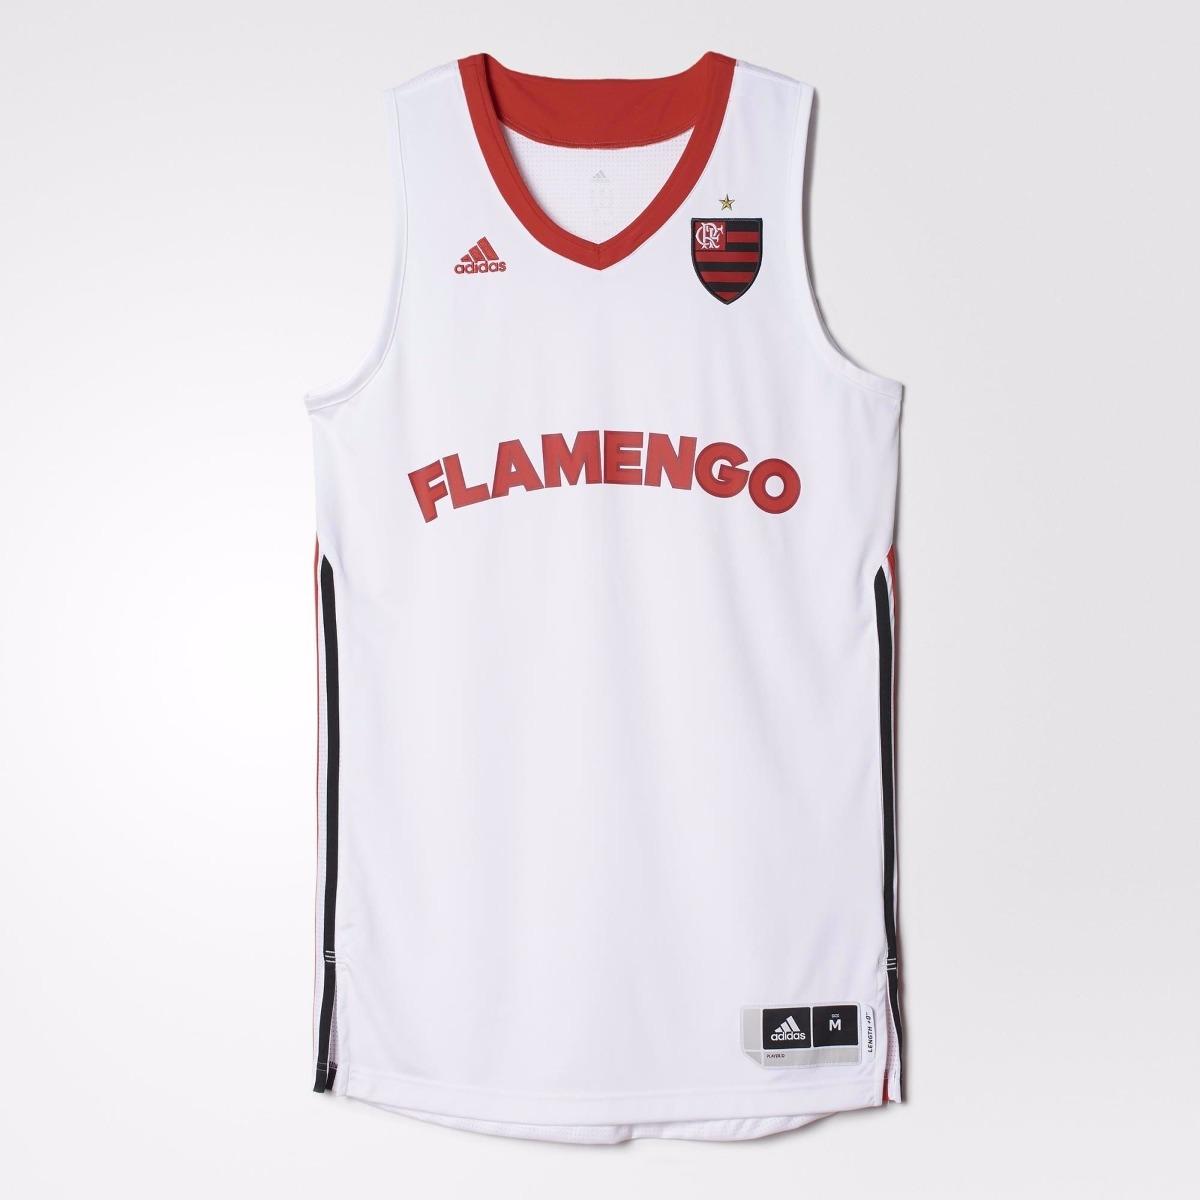 0a9c42b46f71b camisa regata flamengo basquete original adidas - footlet. Carregando zoom.